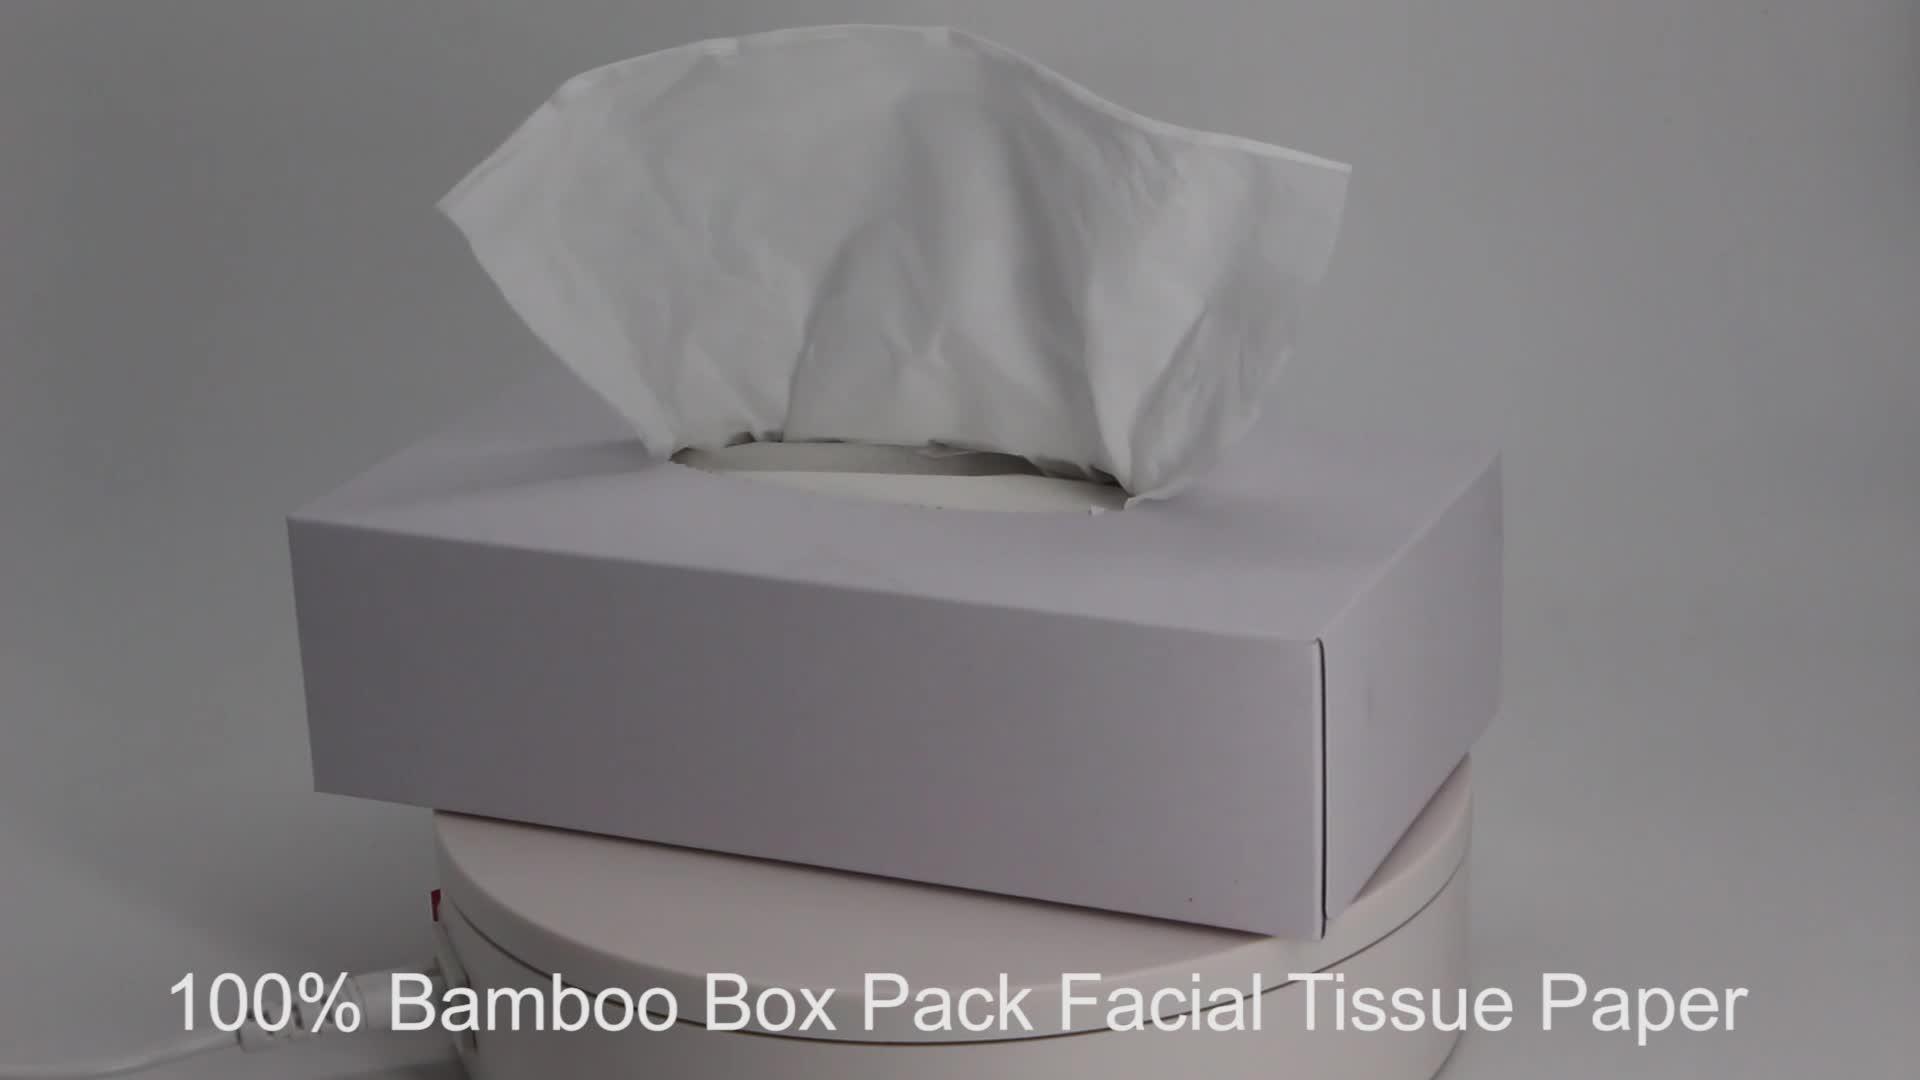 FSC Bamboo Fiber Tissue Paper Cube Box Facial Tissue